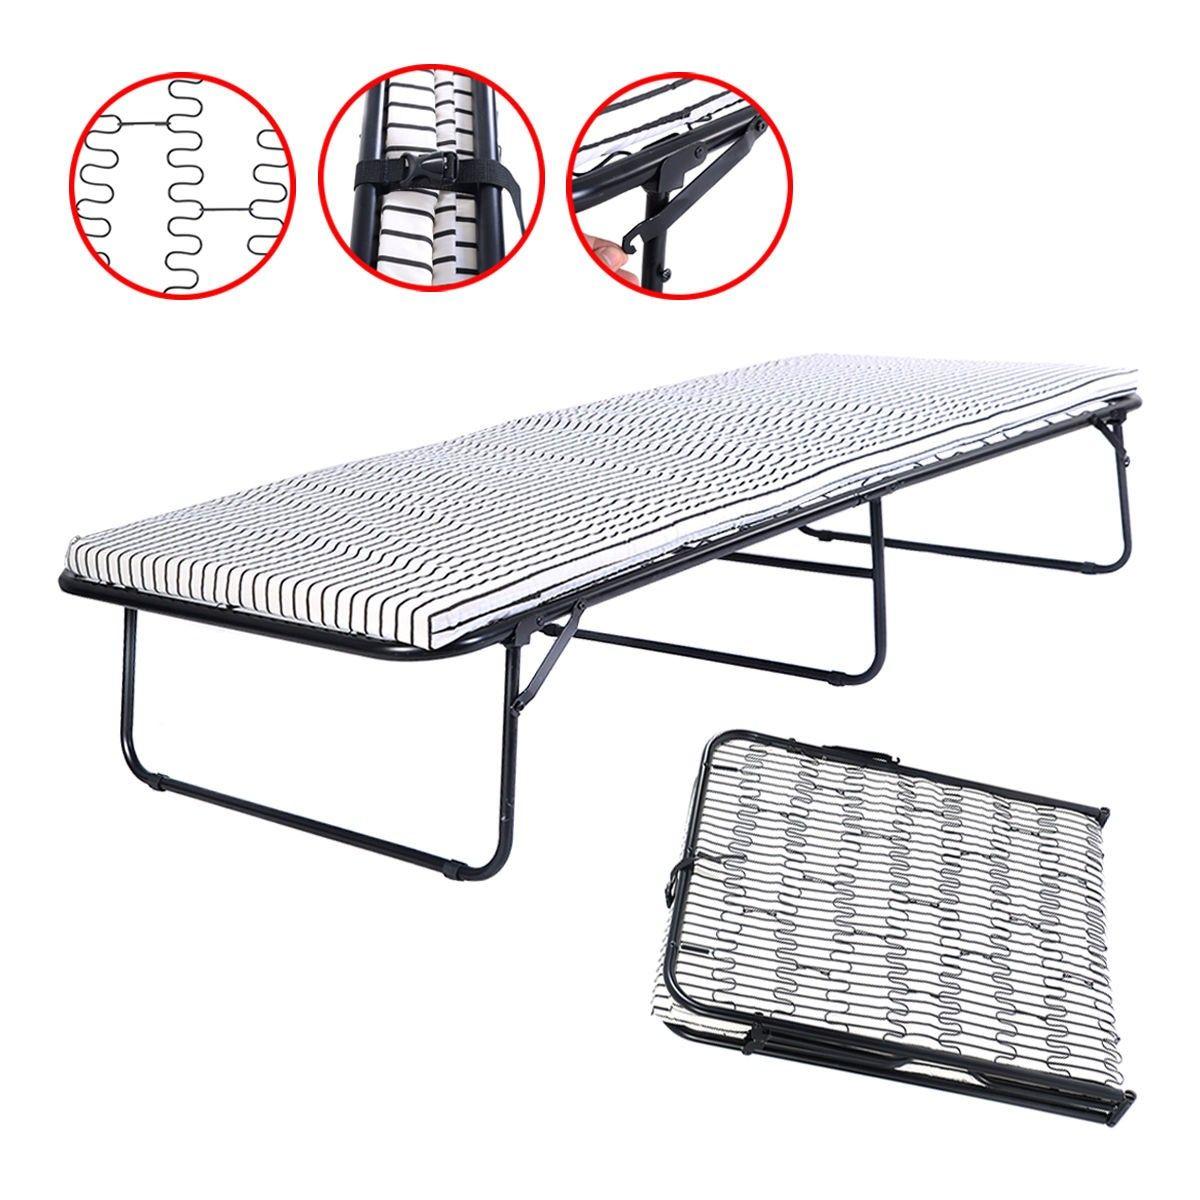 folding metal guest bed spring steel frame mattress cot sleep single